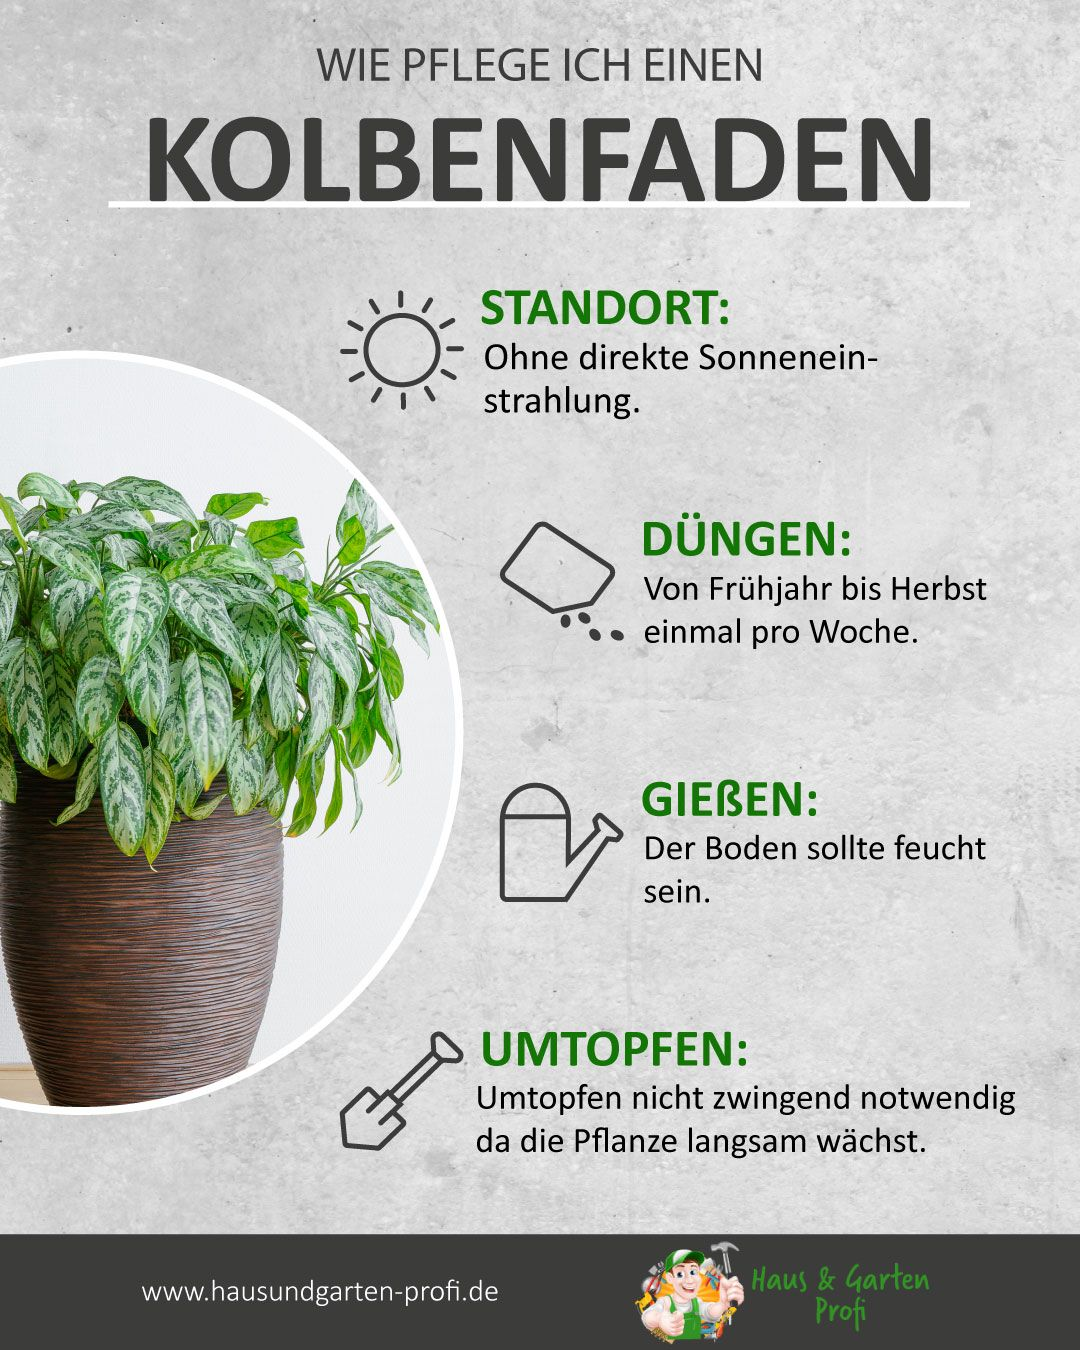 Kolbenfaden: So simpel funktioniert es (Standort, Düngen, Gießen, Umtopfen)